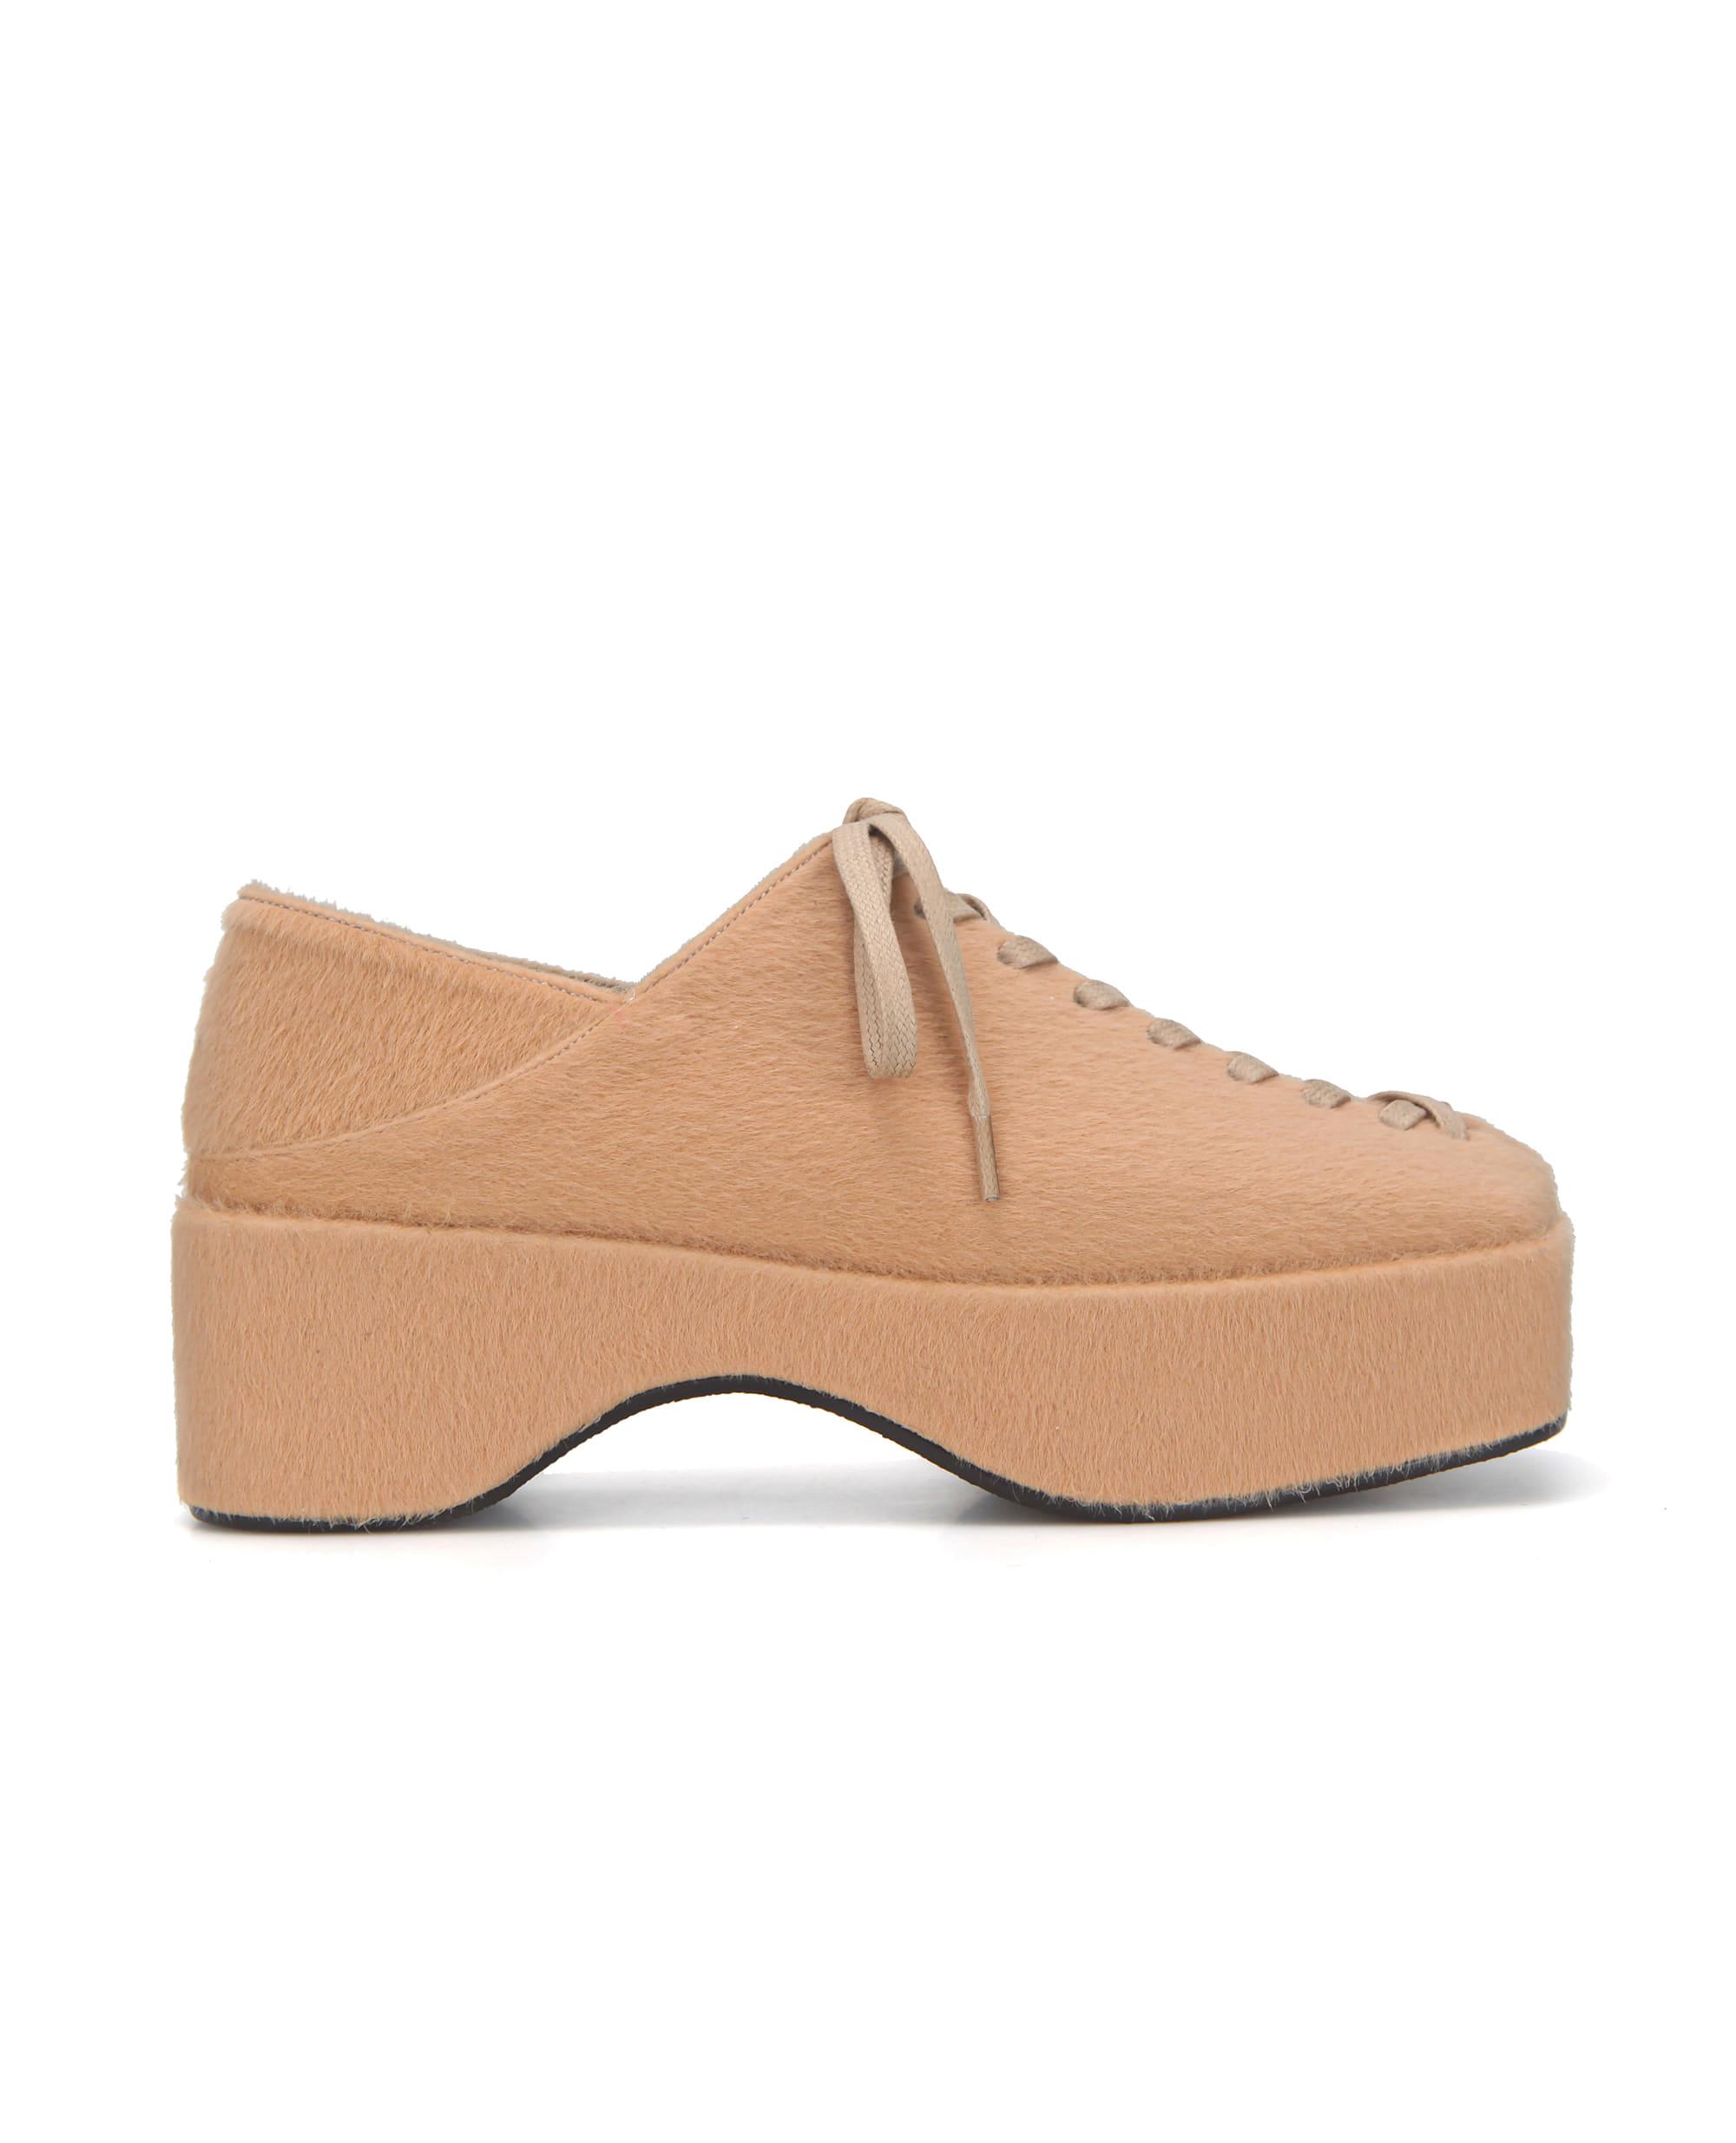 Squared toe lace up platforms | Warm beige